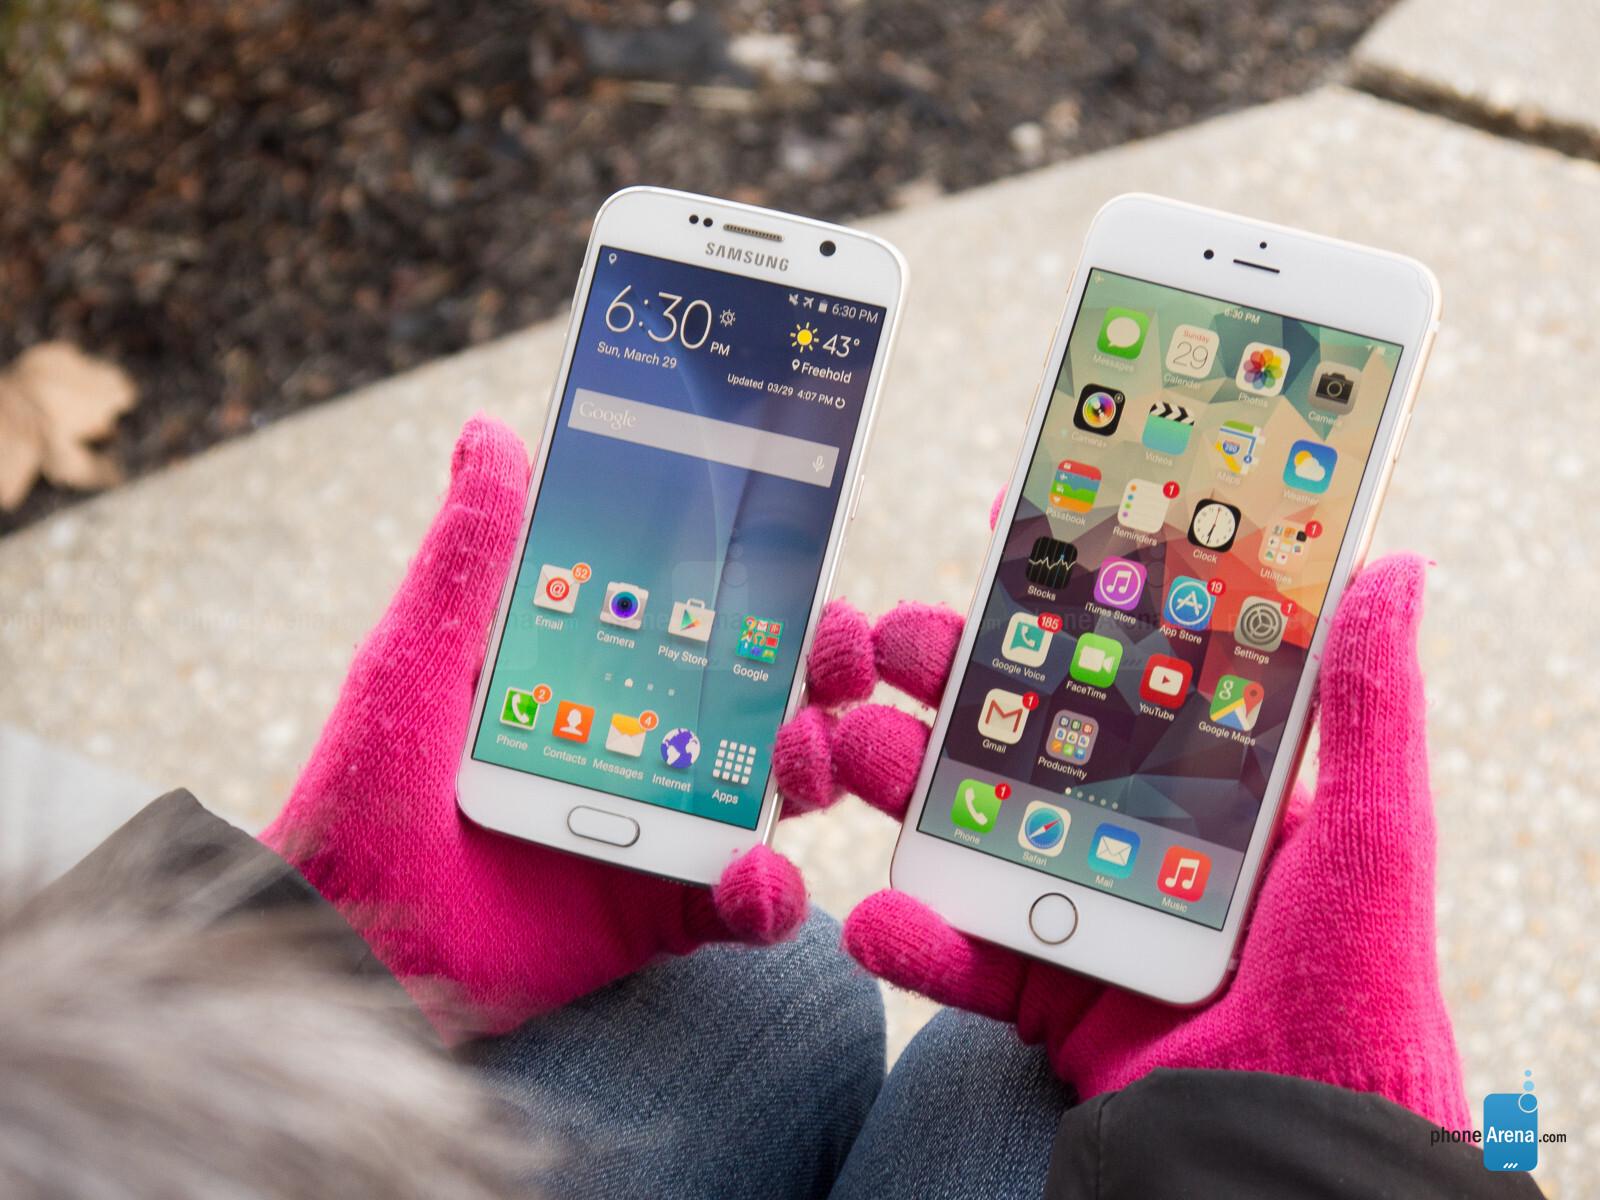 S6 Iphone